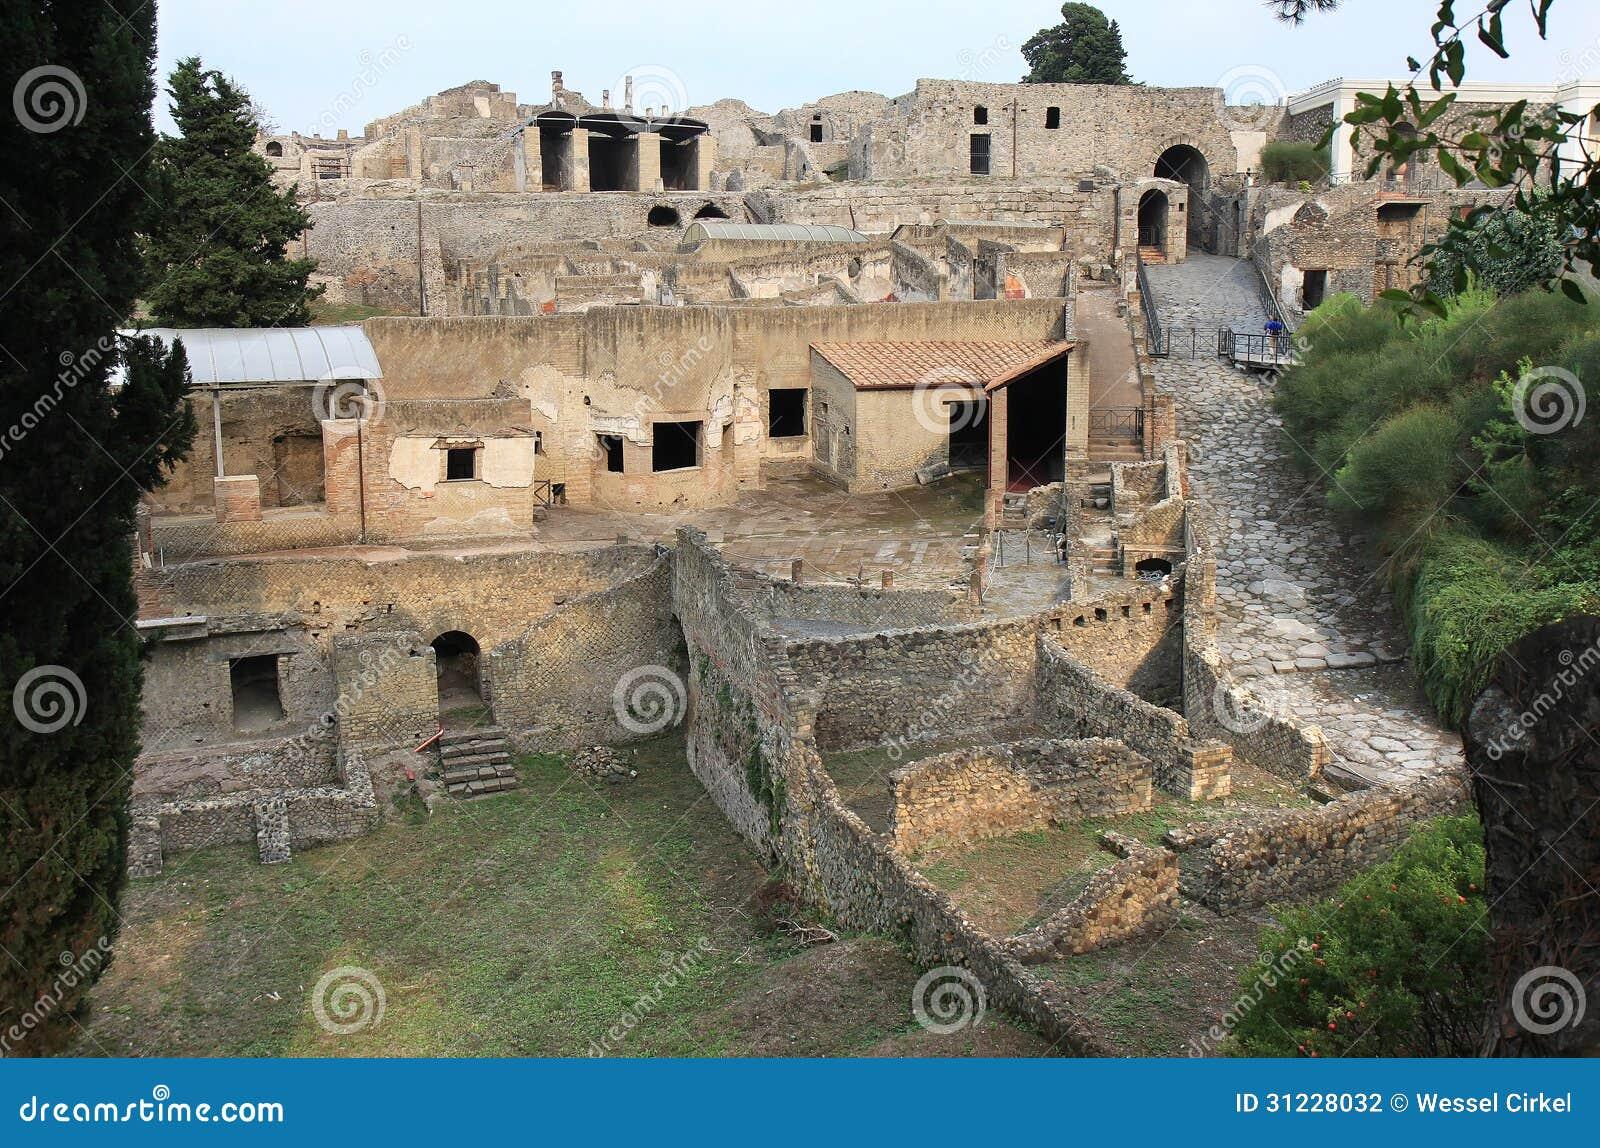 Ruins Of The Ancient Roman Pompei Italy Stock Photo